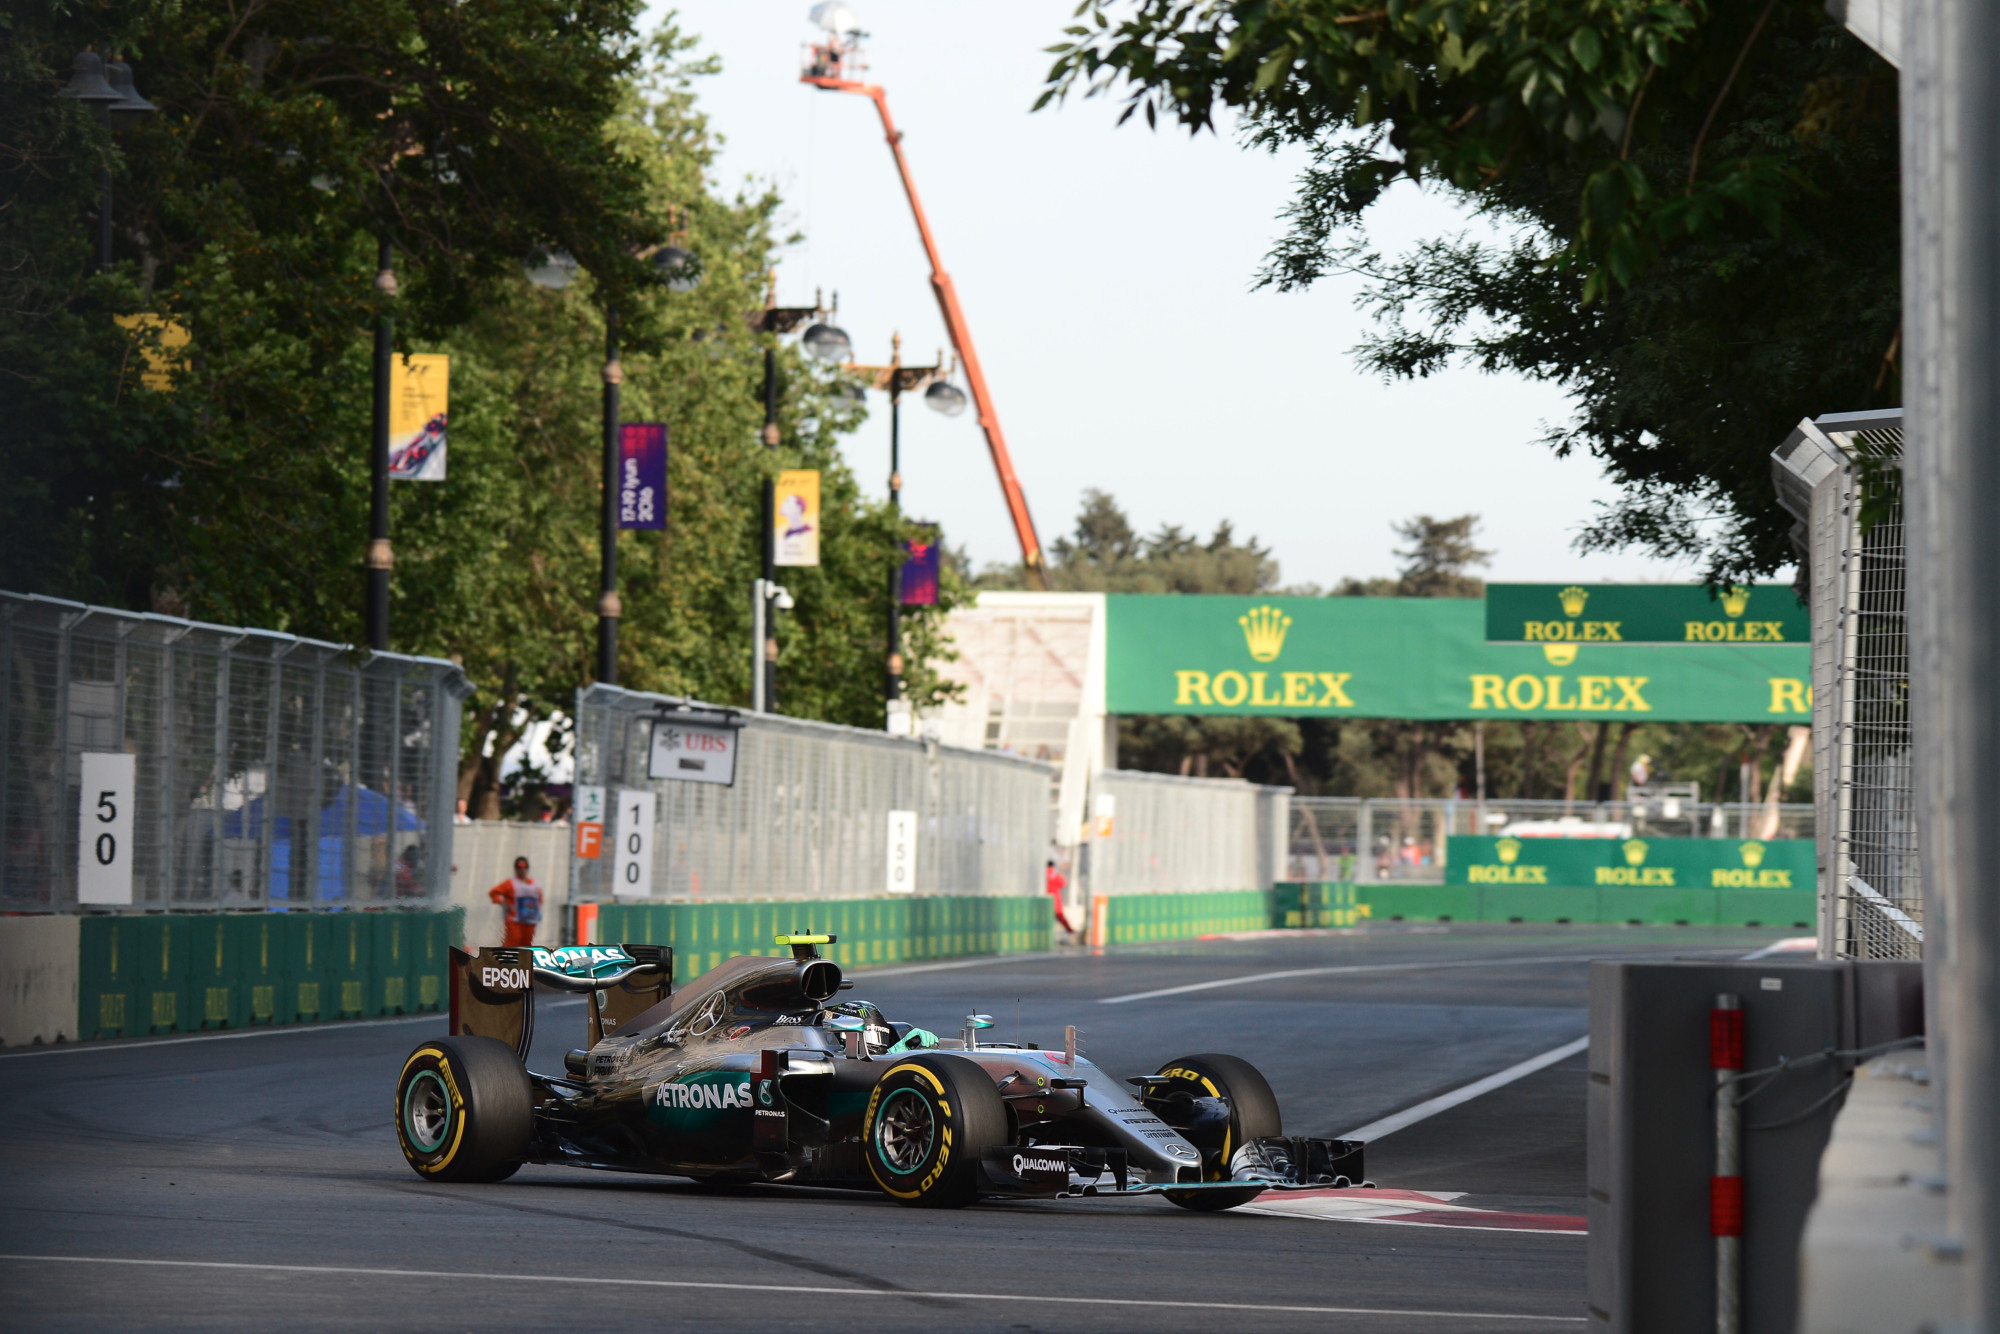 Nico Rosberg leading the European GP